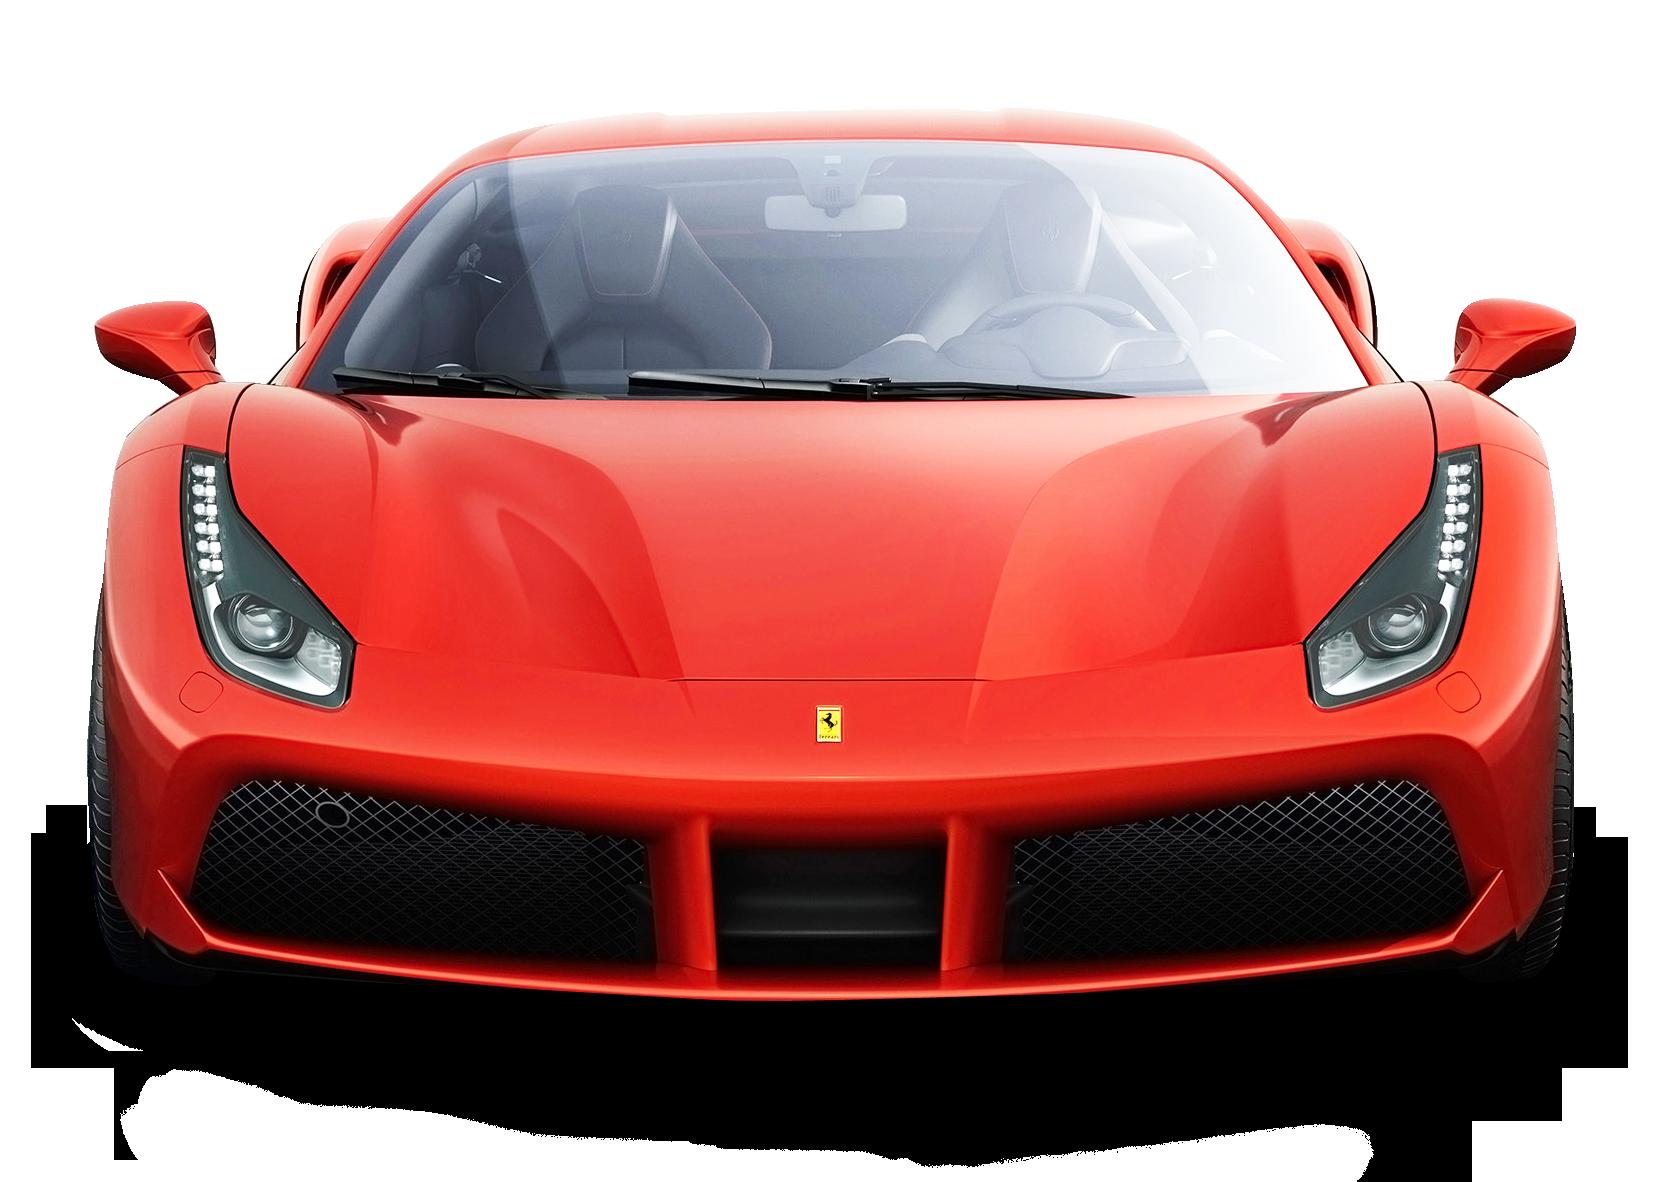 Ferrari 488 GTB Red Car PNG Image